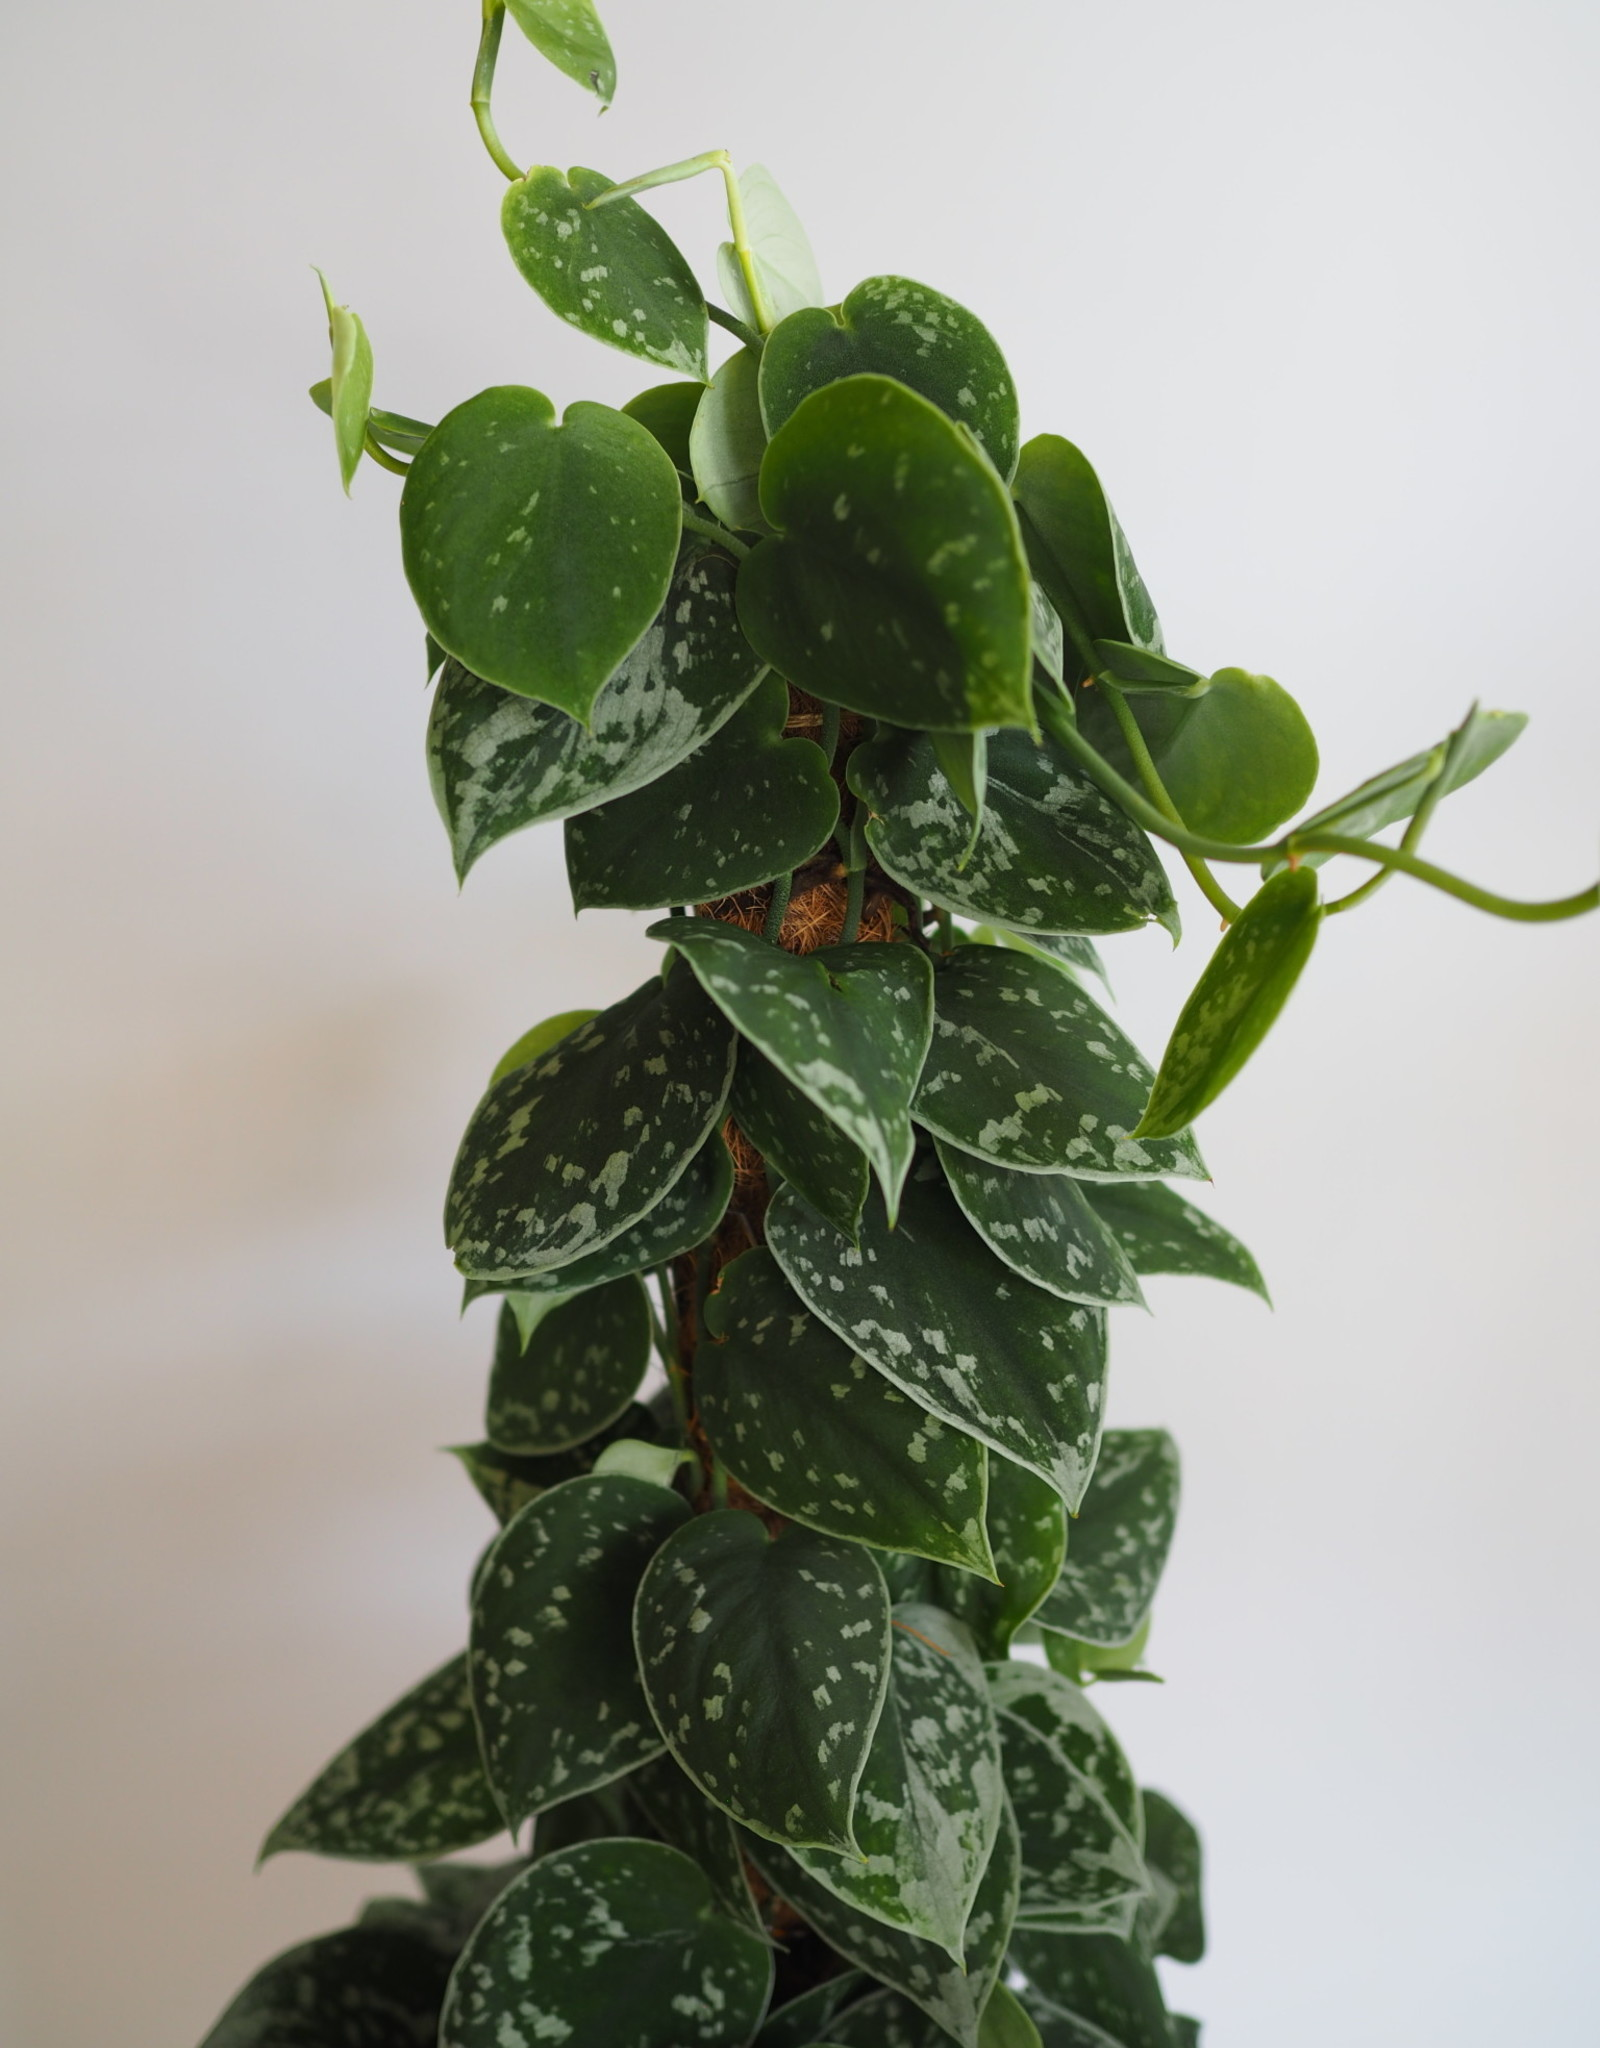 GRUUN Scindapsus pictus 'Silvery Ann' Ø17 h60 (moss pole)